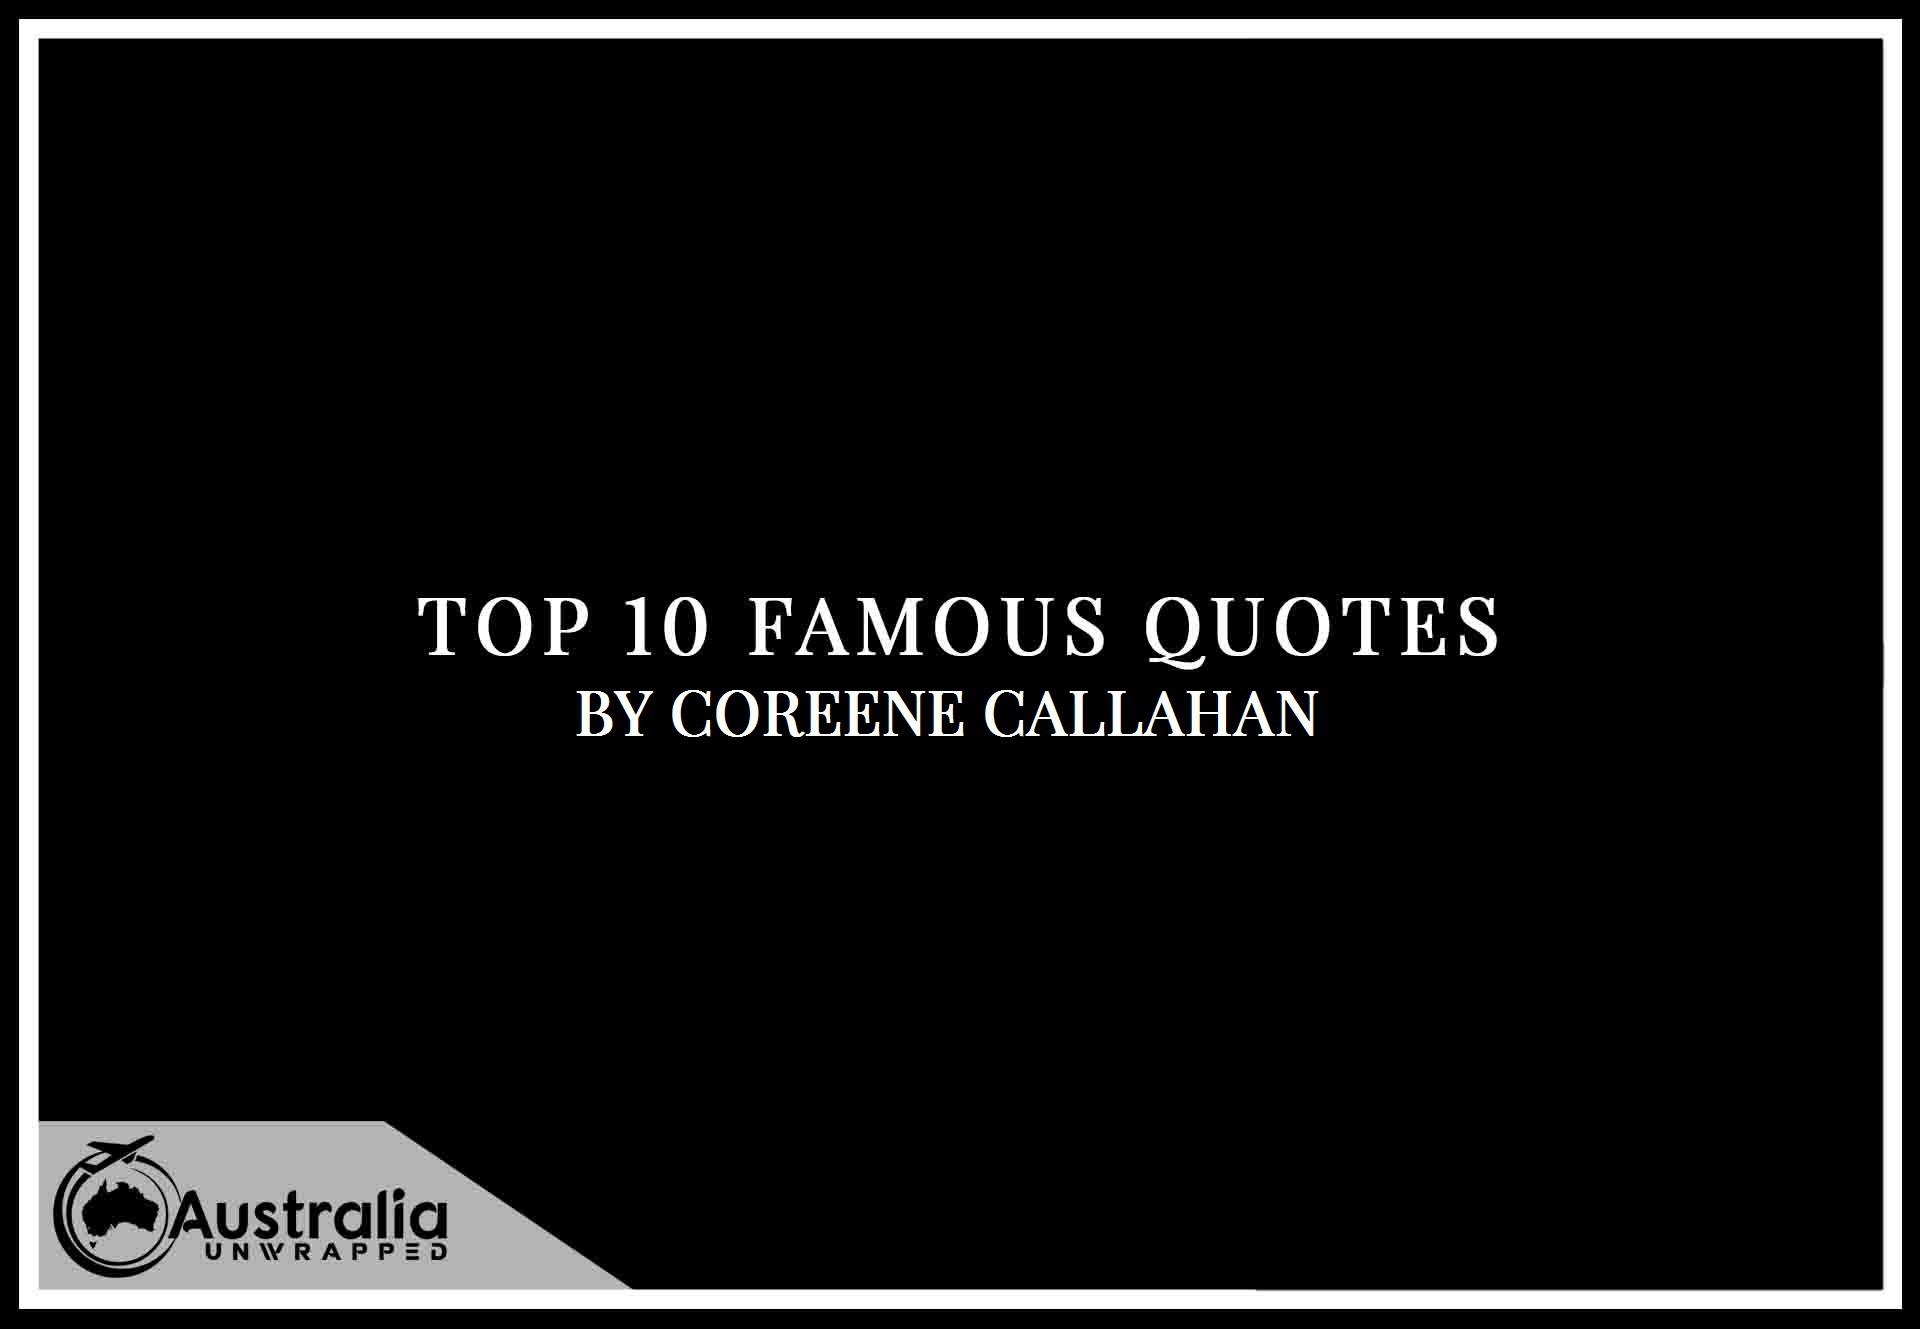 Coreene Callahan's Top 10 Popular and Famous Quotes